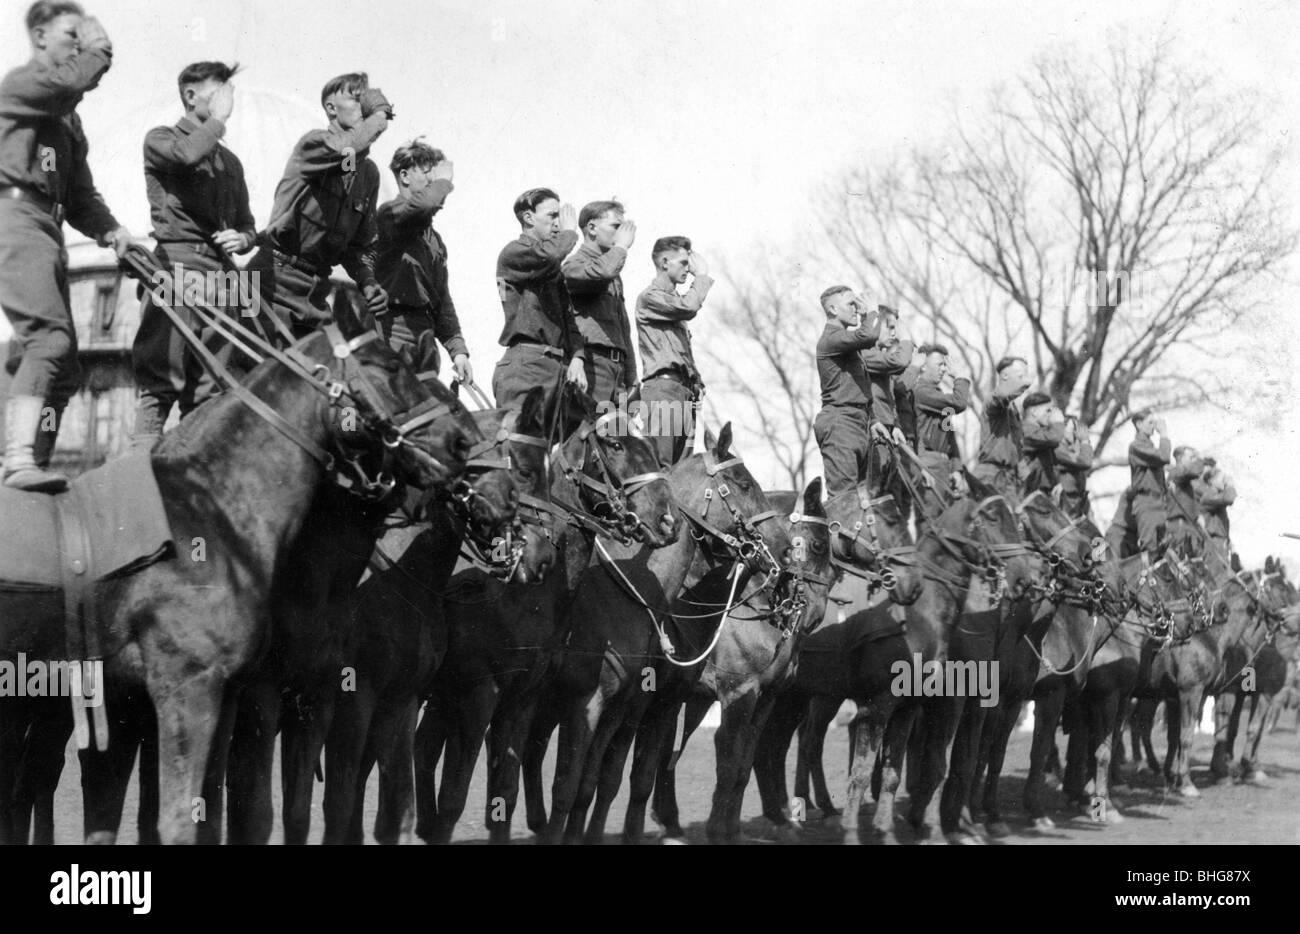 Soldiers saluting while standing on horseback, Fort Sheridan, Illinois, USA, 1920. - Stock Image